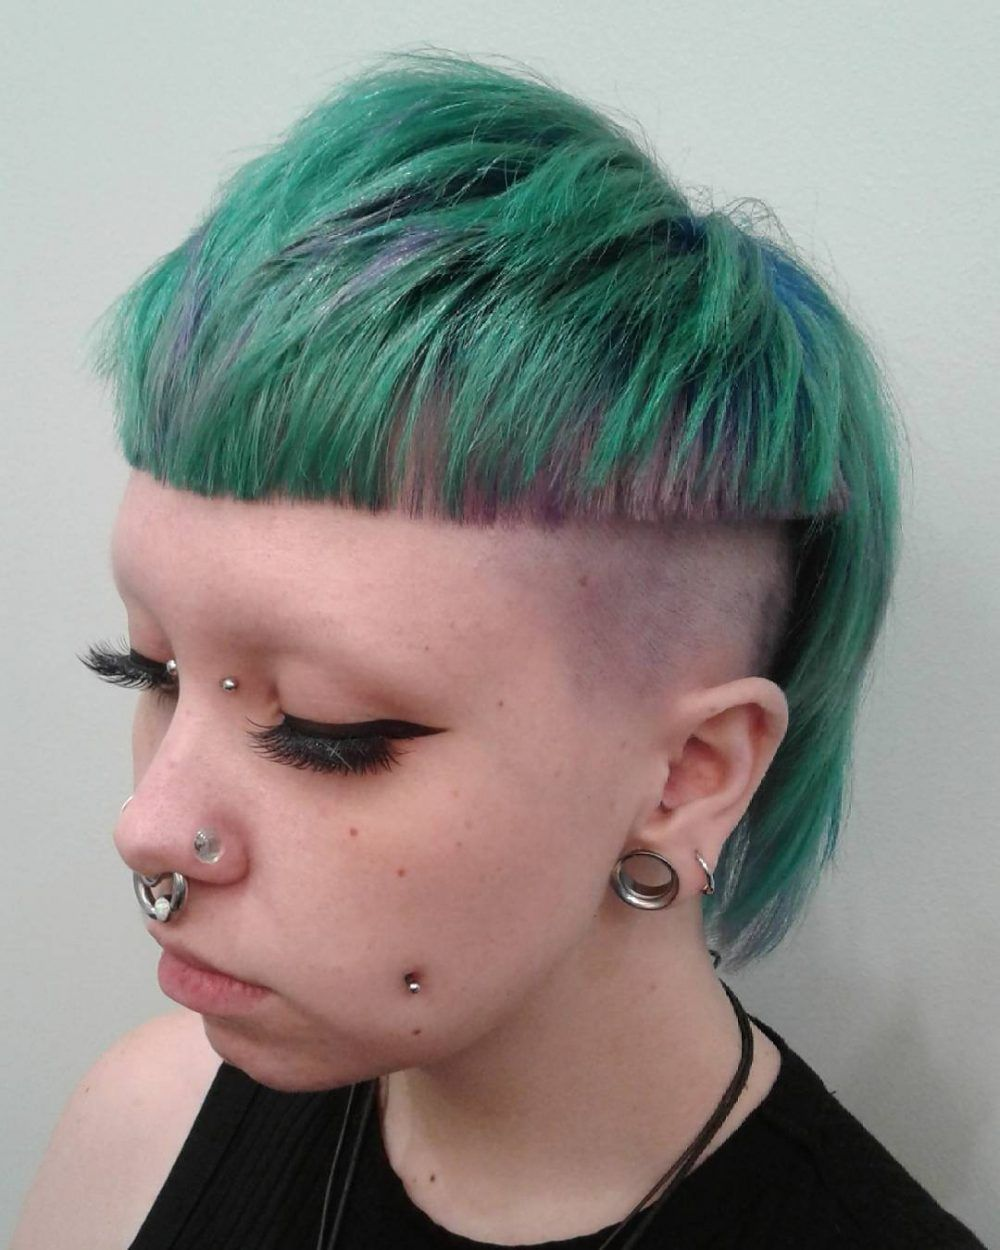 18 Punk Hairstyles For Women Trending In 2019 Hair Inspo